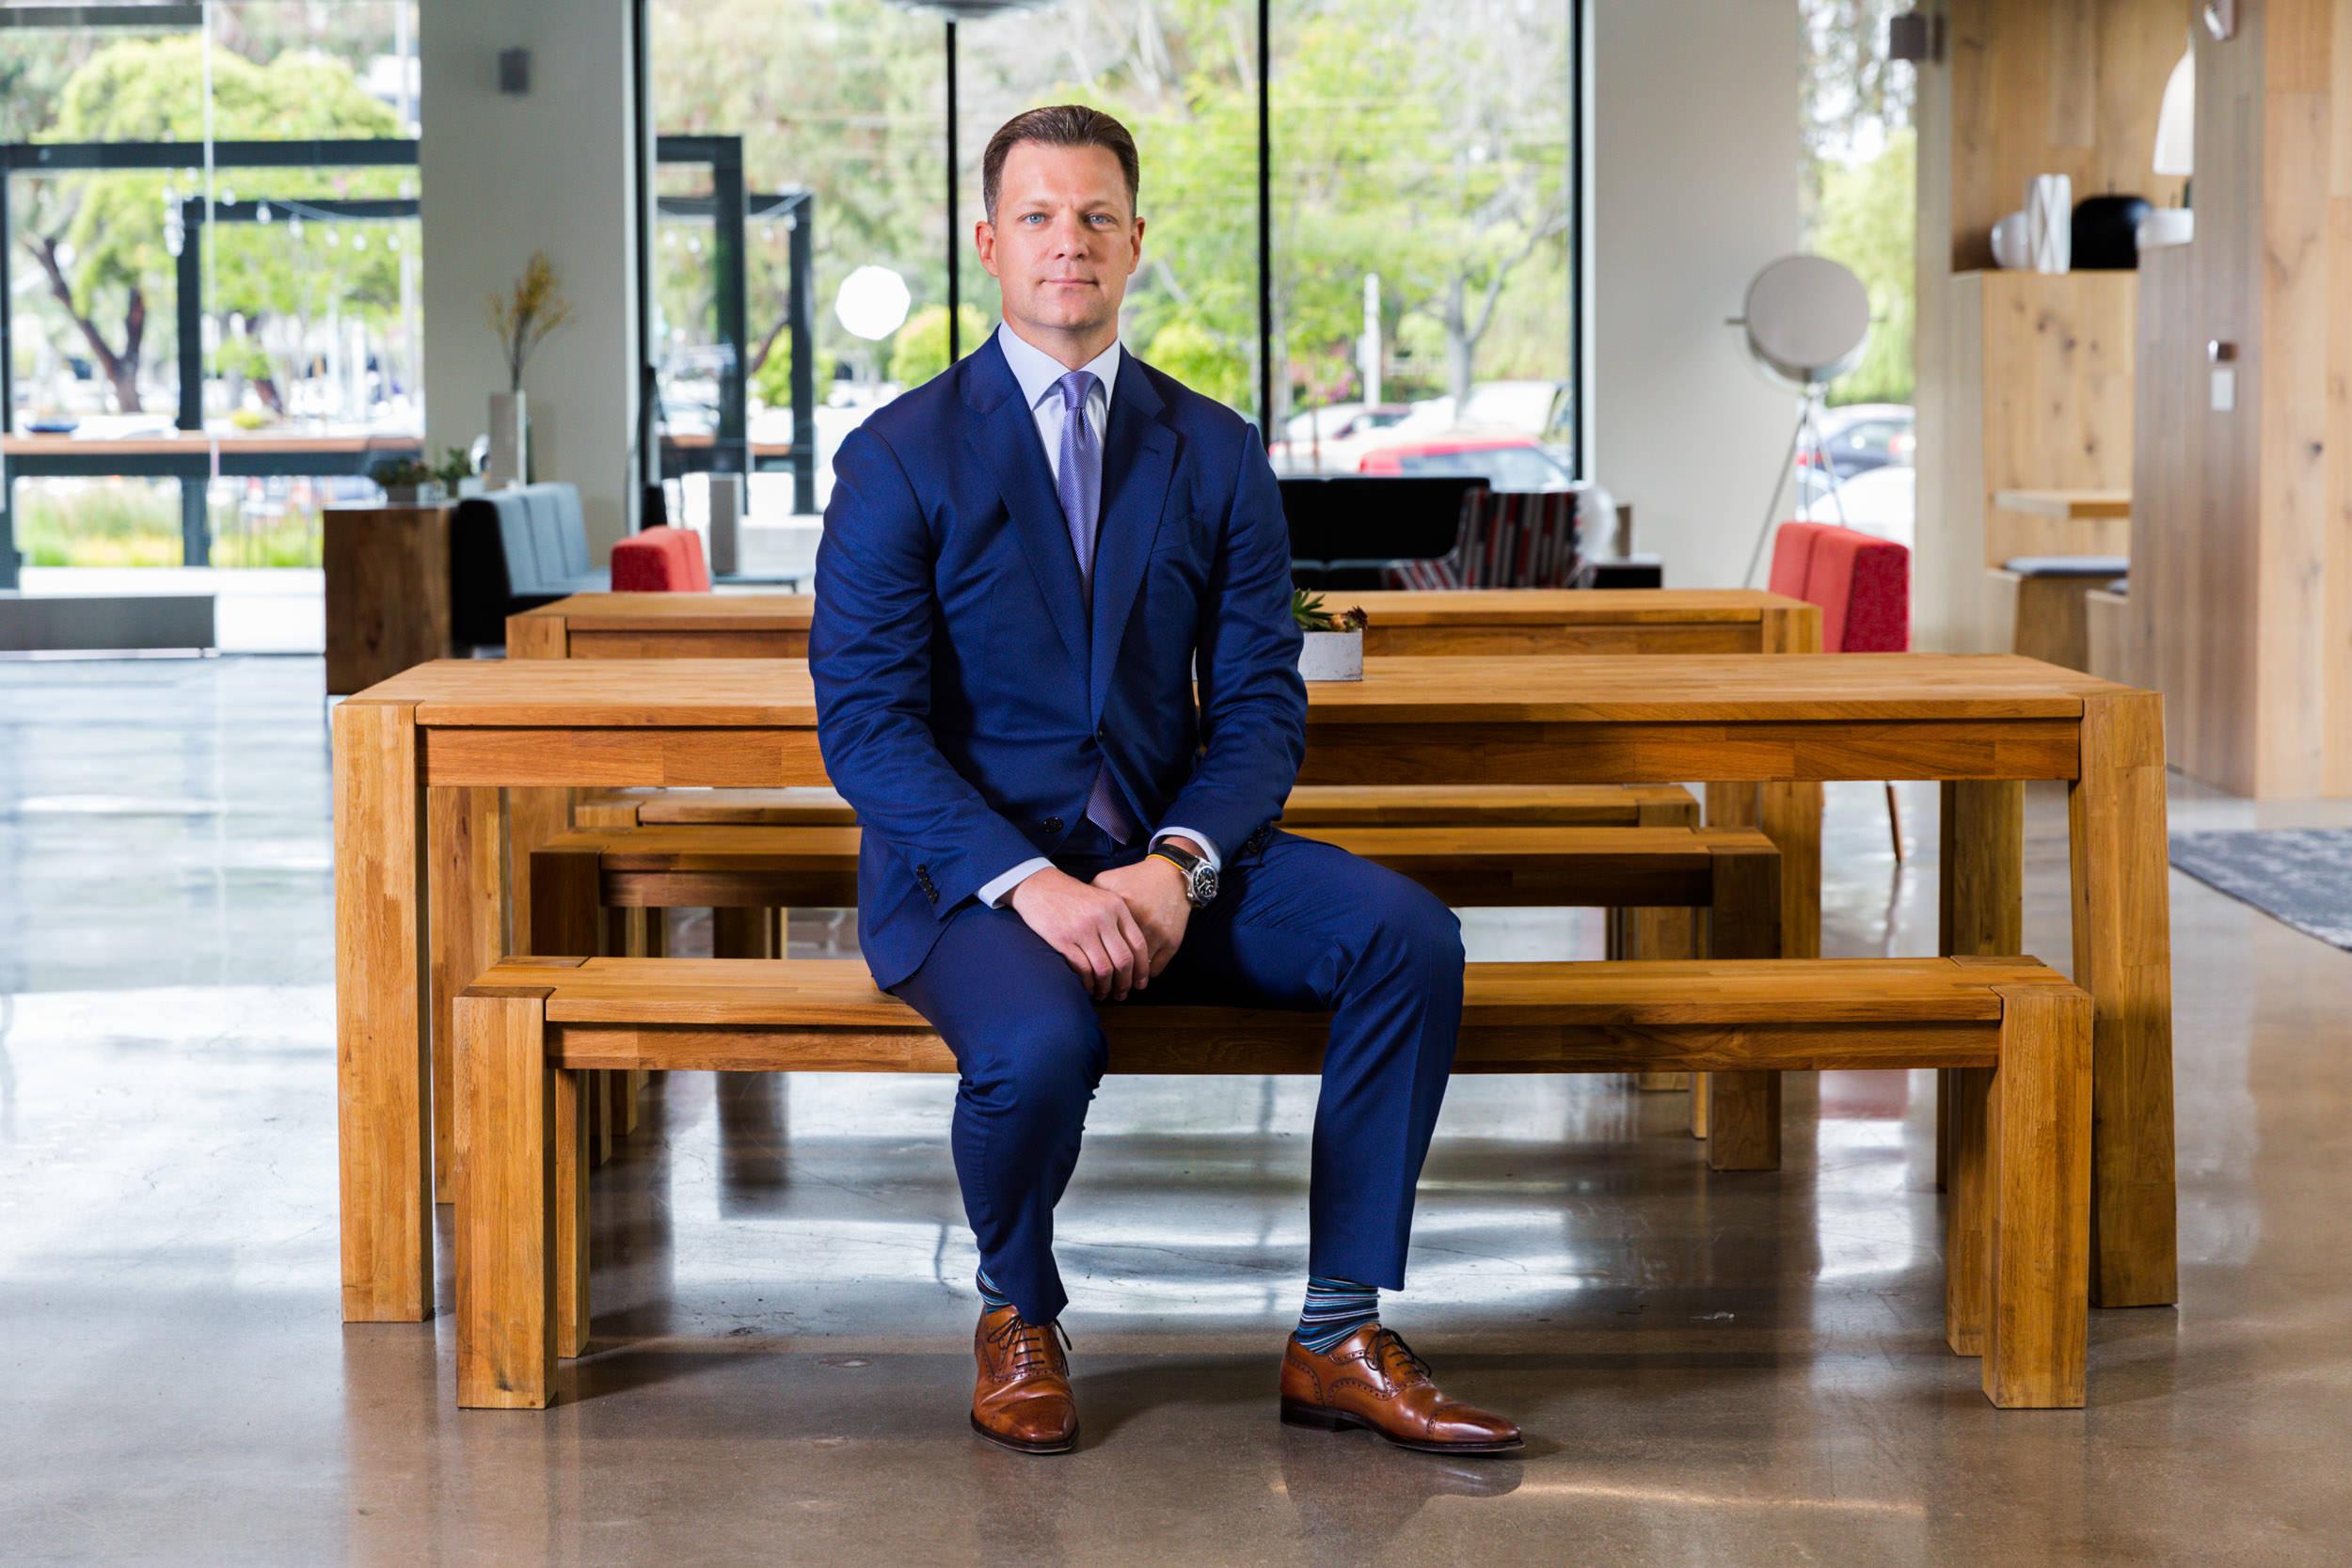 Marketo CEO Steve Lucas